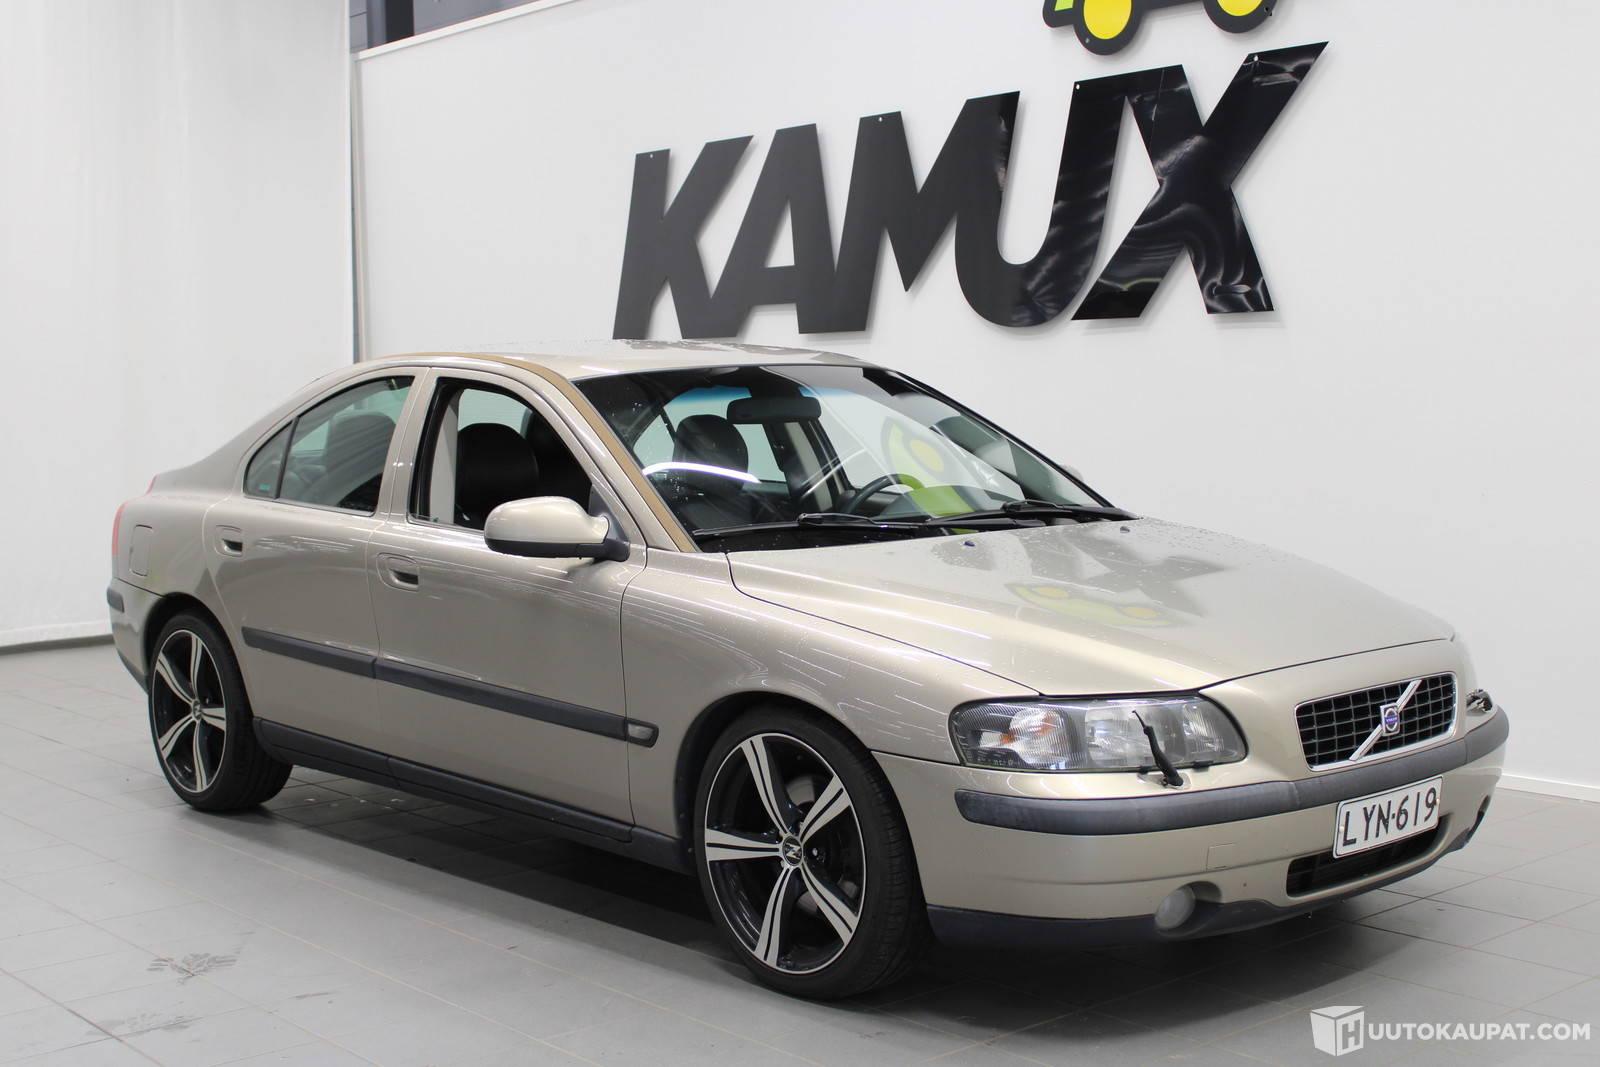 Volvo S60 T5 >> Kohde On Poistunut Myynnista Huutokaupat Com